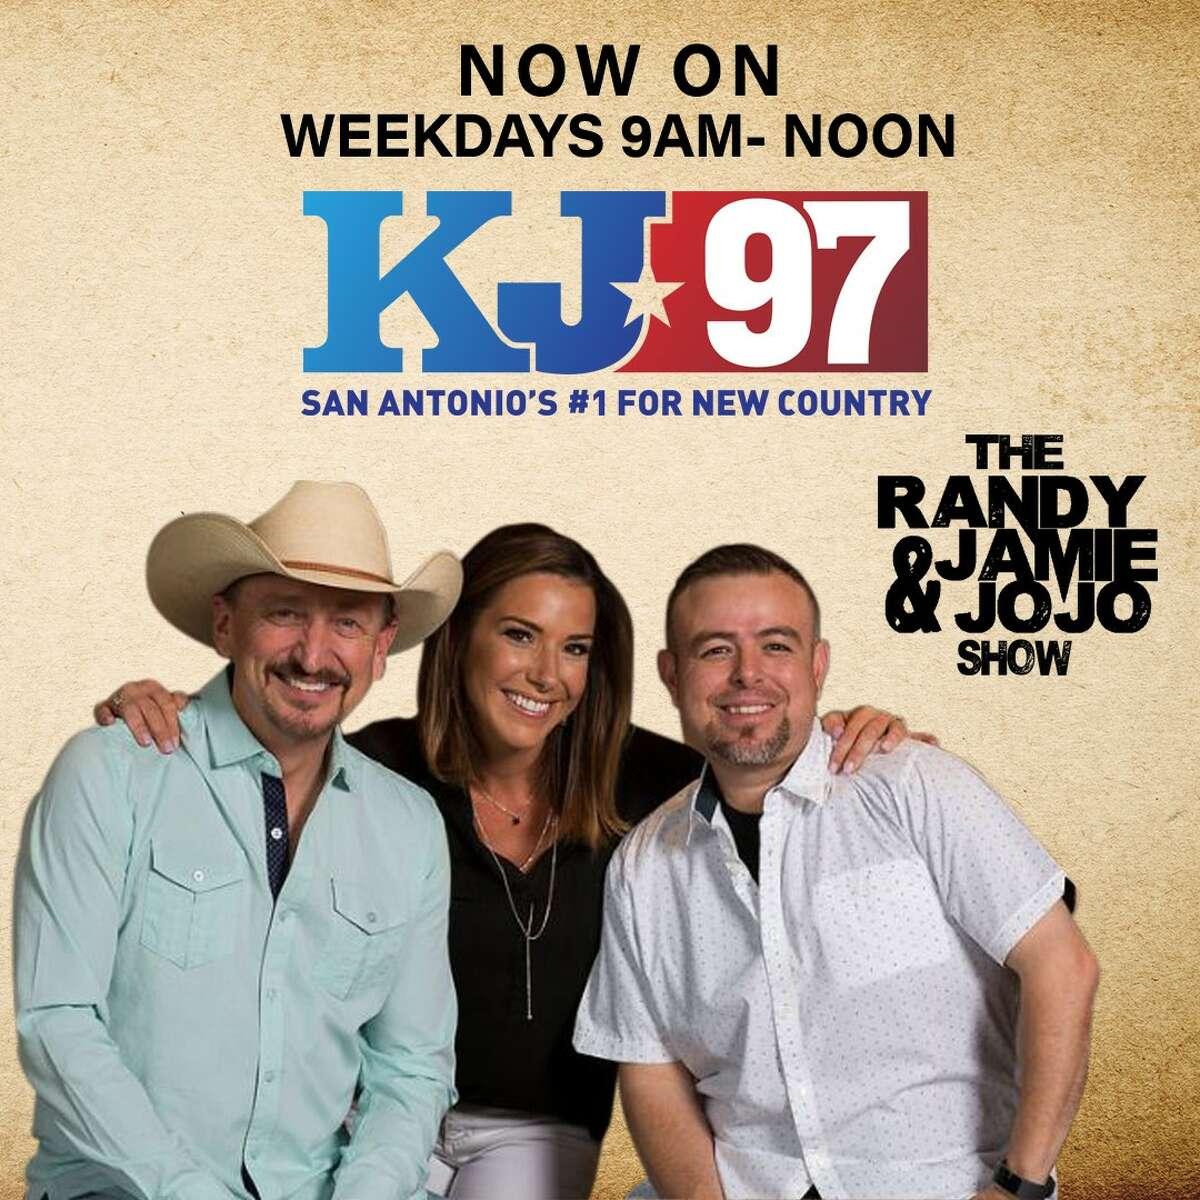 The Randy, Jamie & JoJo show, KJ-97 Wake up to this trio weekday mornings. JoJo joined Randy and Jamie in 2015 after spending time in Austin Radio. Follow: @randyjaimejojo